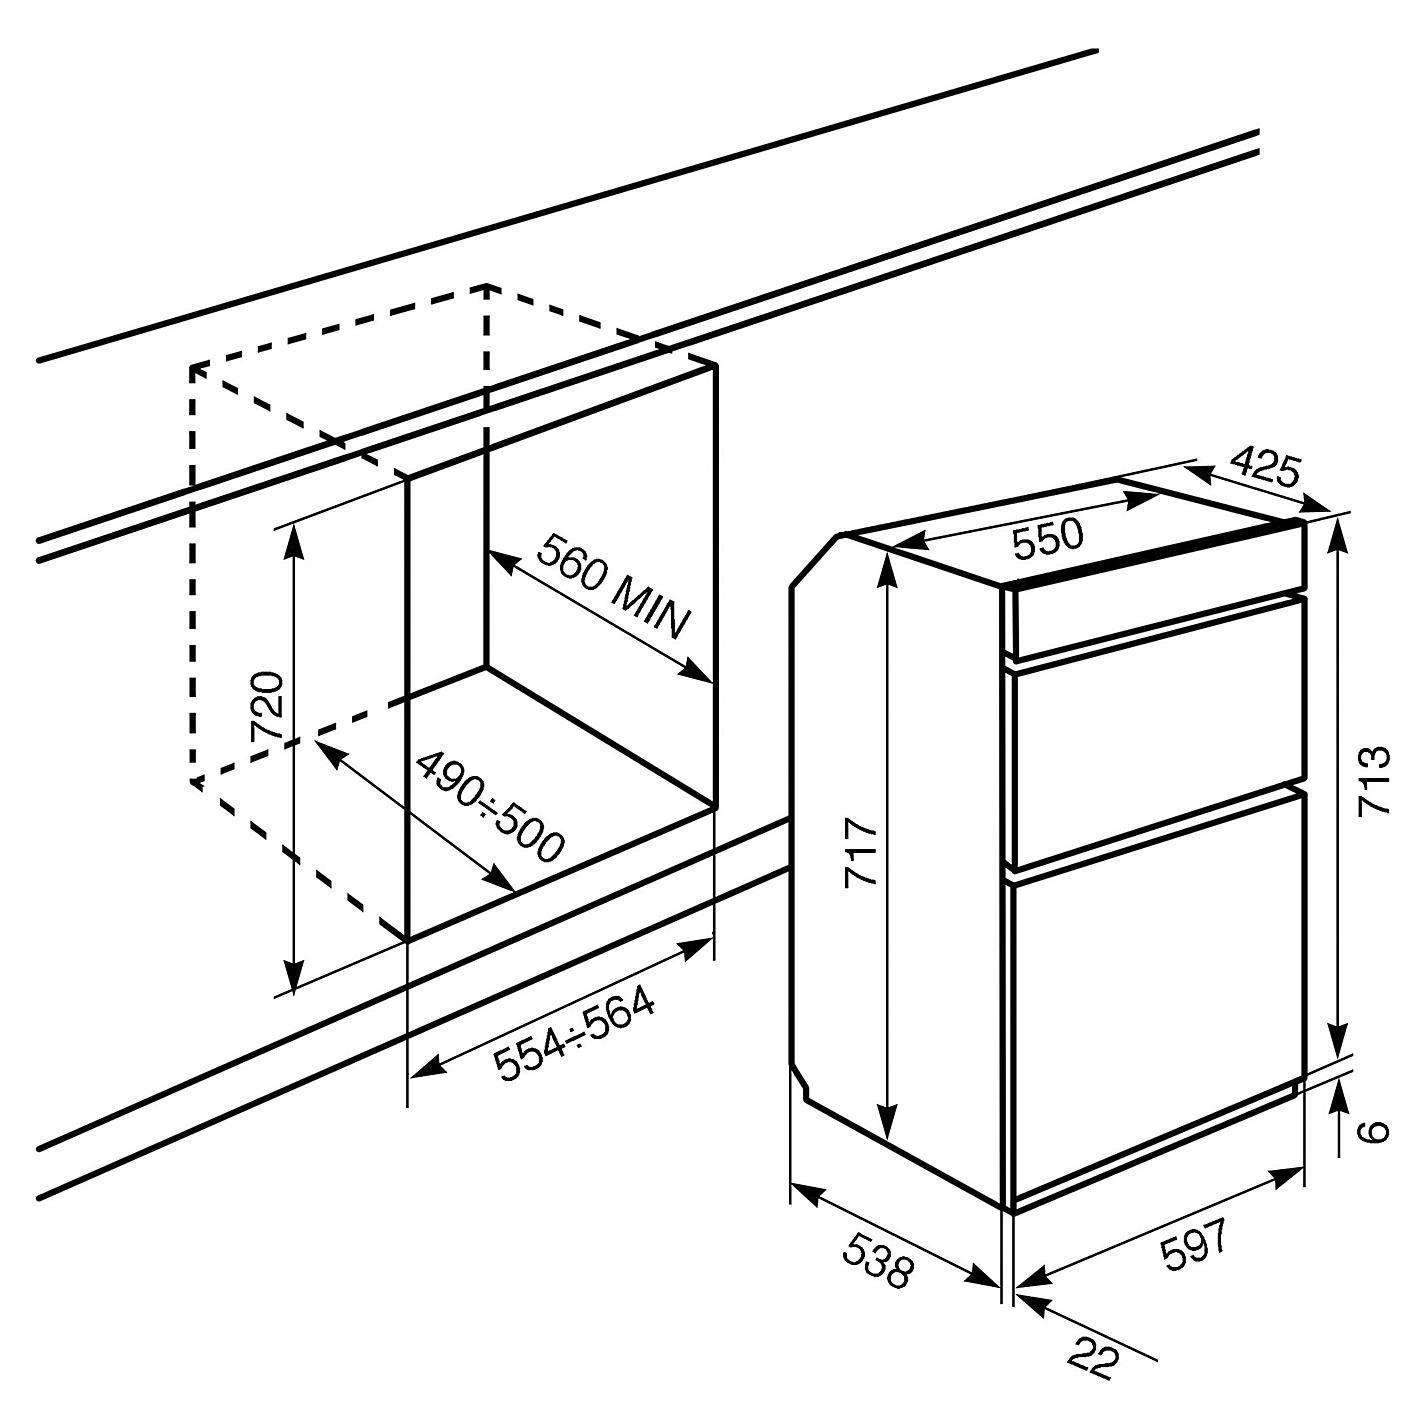 Wiring Diagram Parrot Ck3100 Wiring Parrot Ck3100 Speaker Wiring